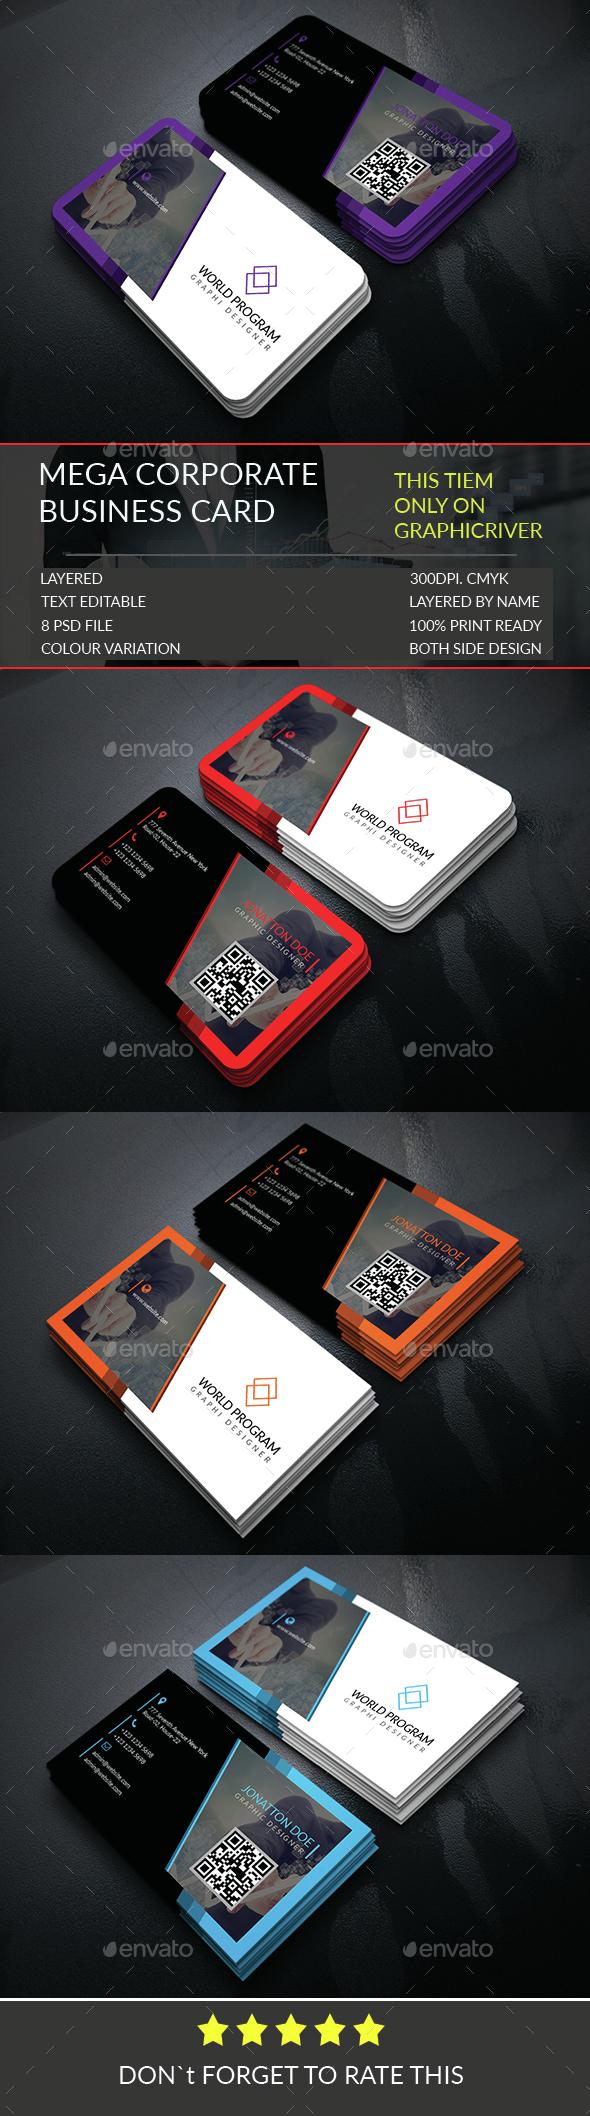 Mega Corporate Business Card Template.306 - Corporate Business Cards